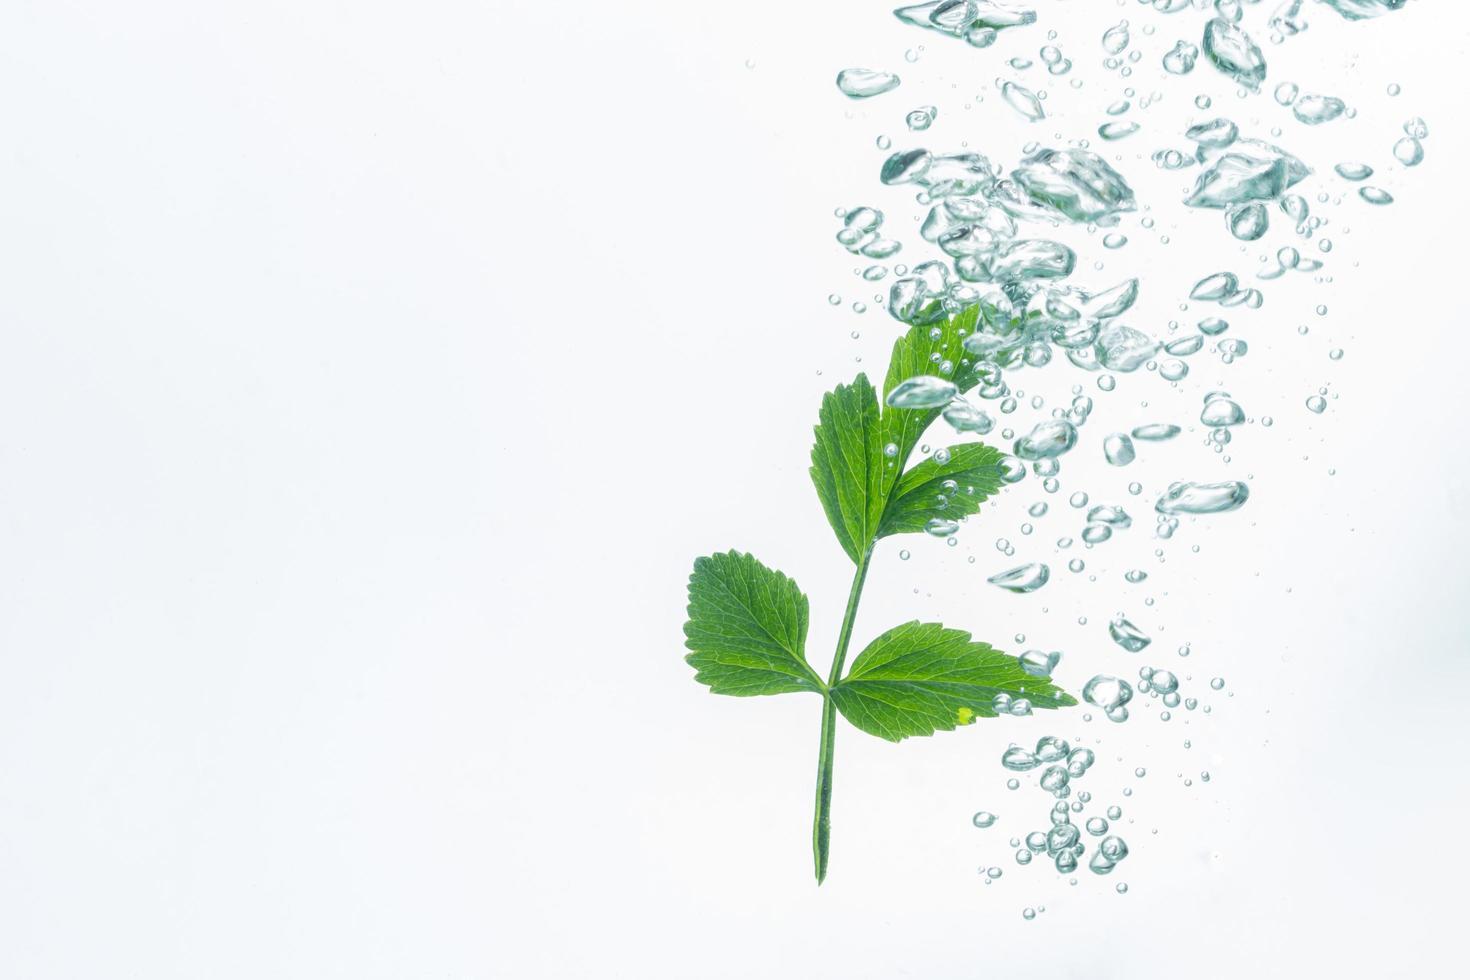 groene plant en bellen in het water foto